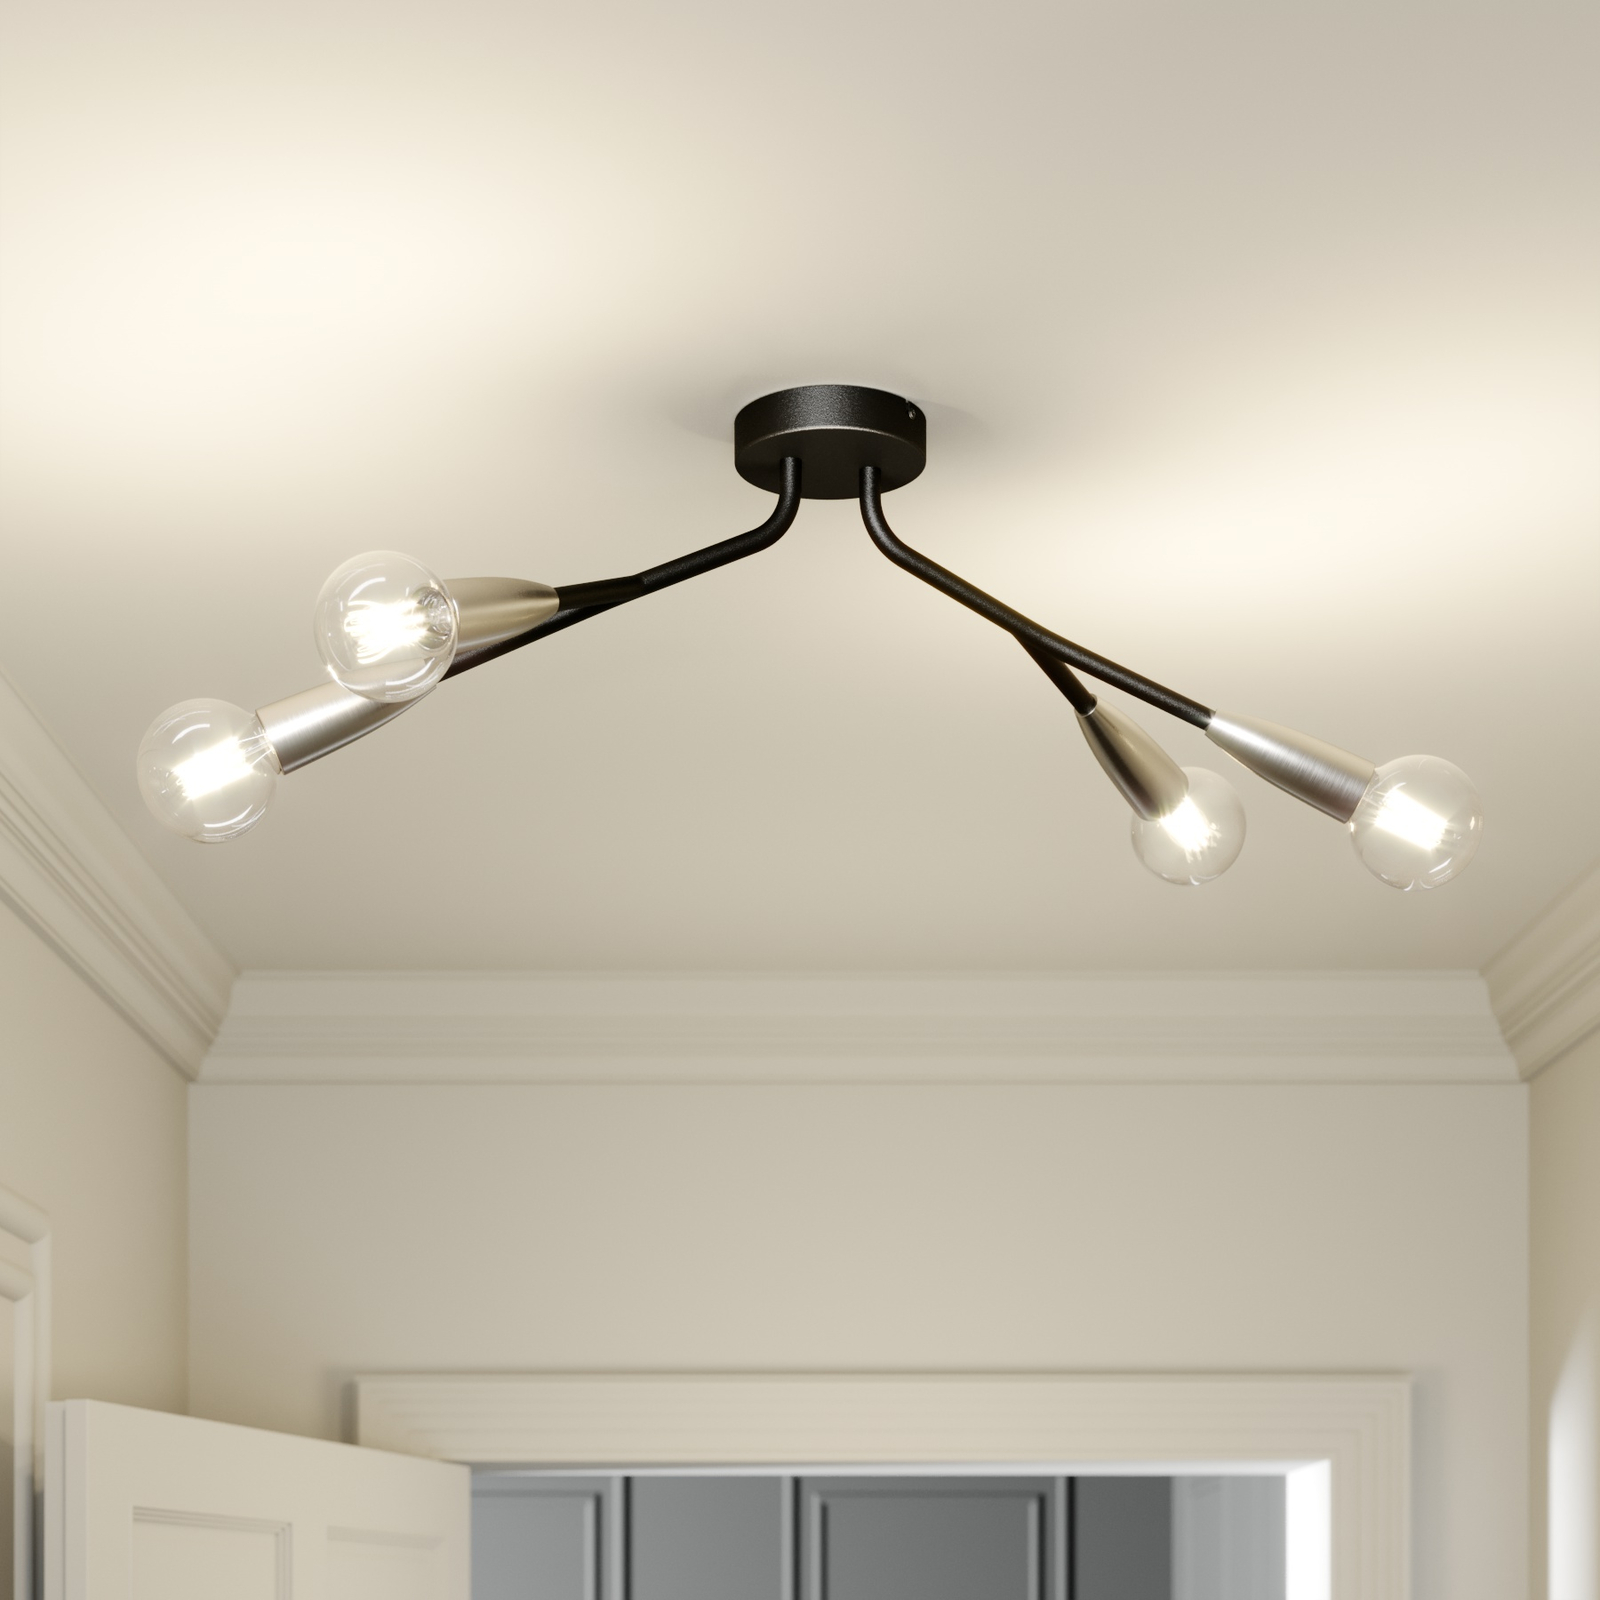 Lucande Carlea taklampe, 4 lyskilder, svart nikkel